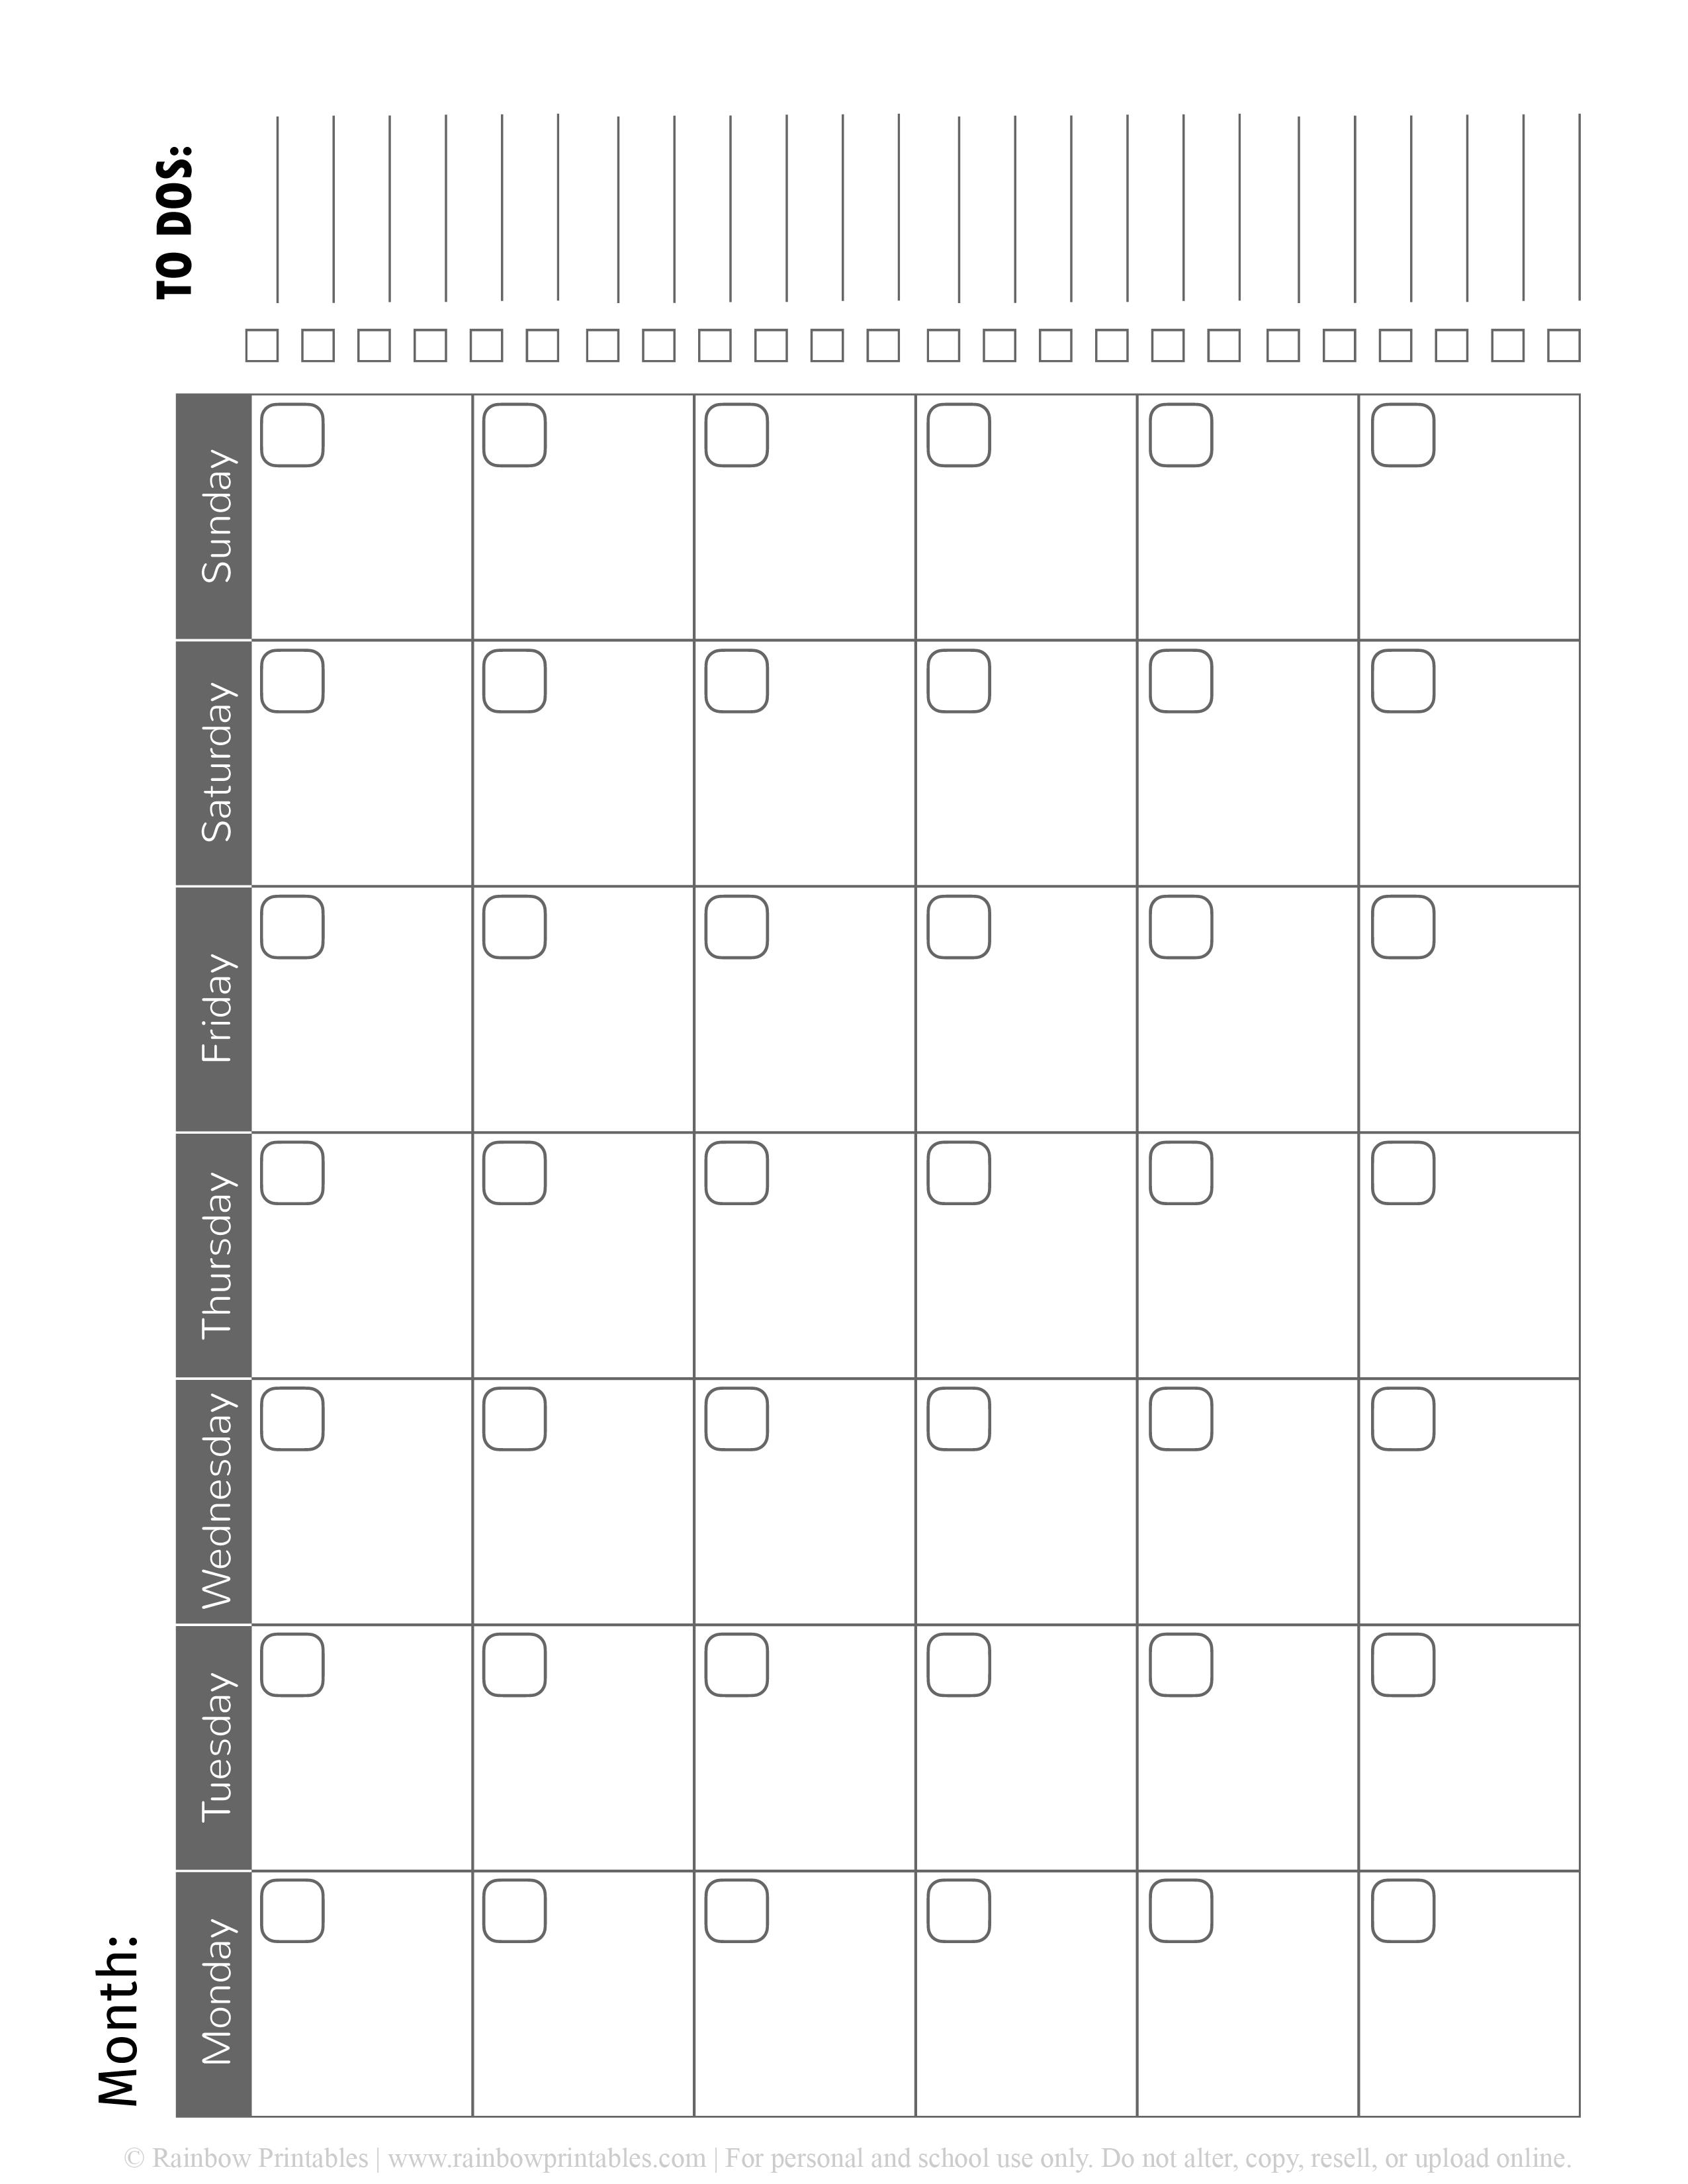 Blank Calendar Printable Free Black White Monthly To Do List-01-01